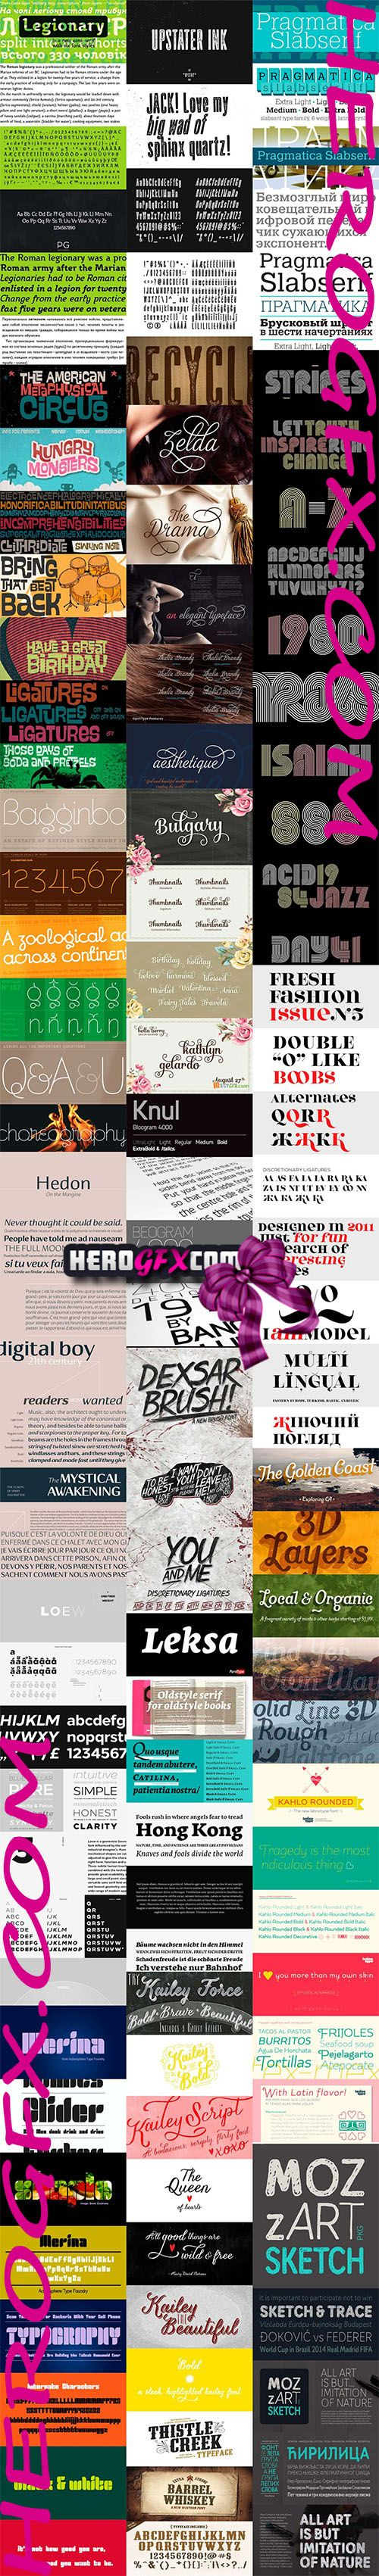 Bundle Set Font Family - HeroGfx Pack 6 Fonts 475$